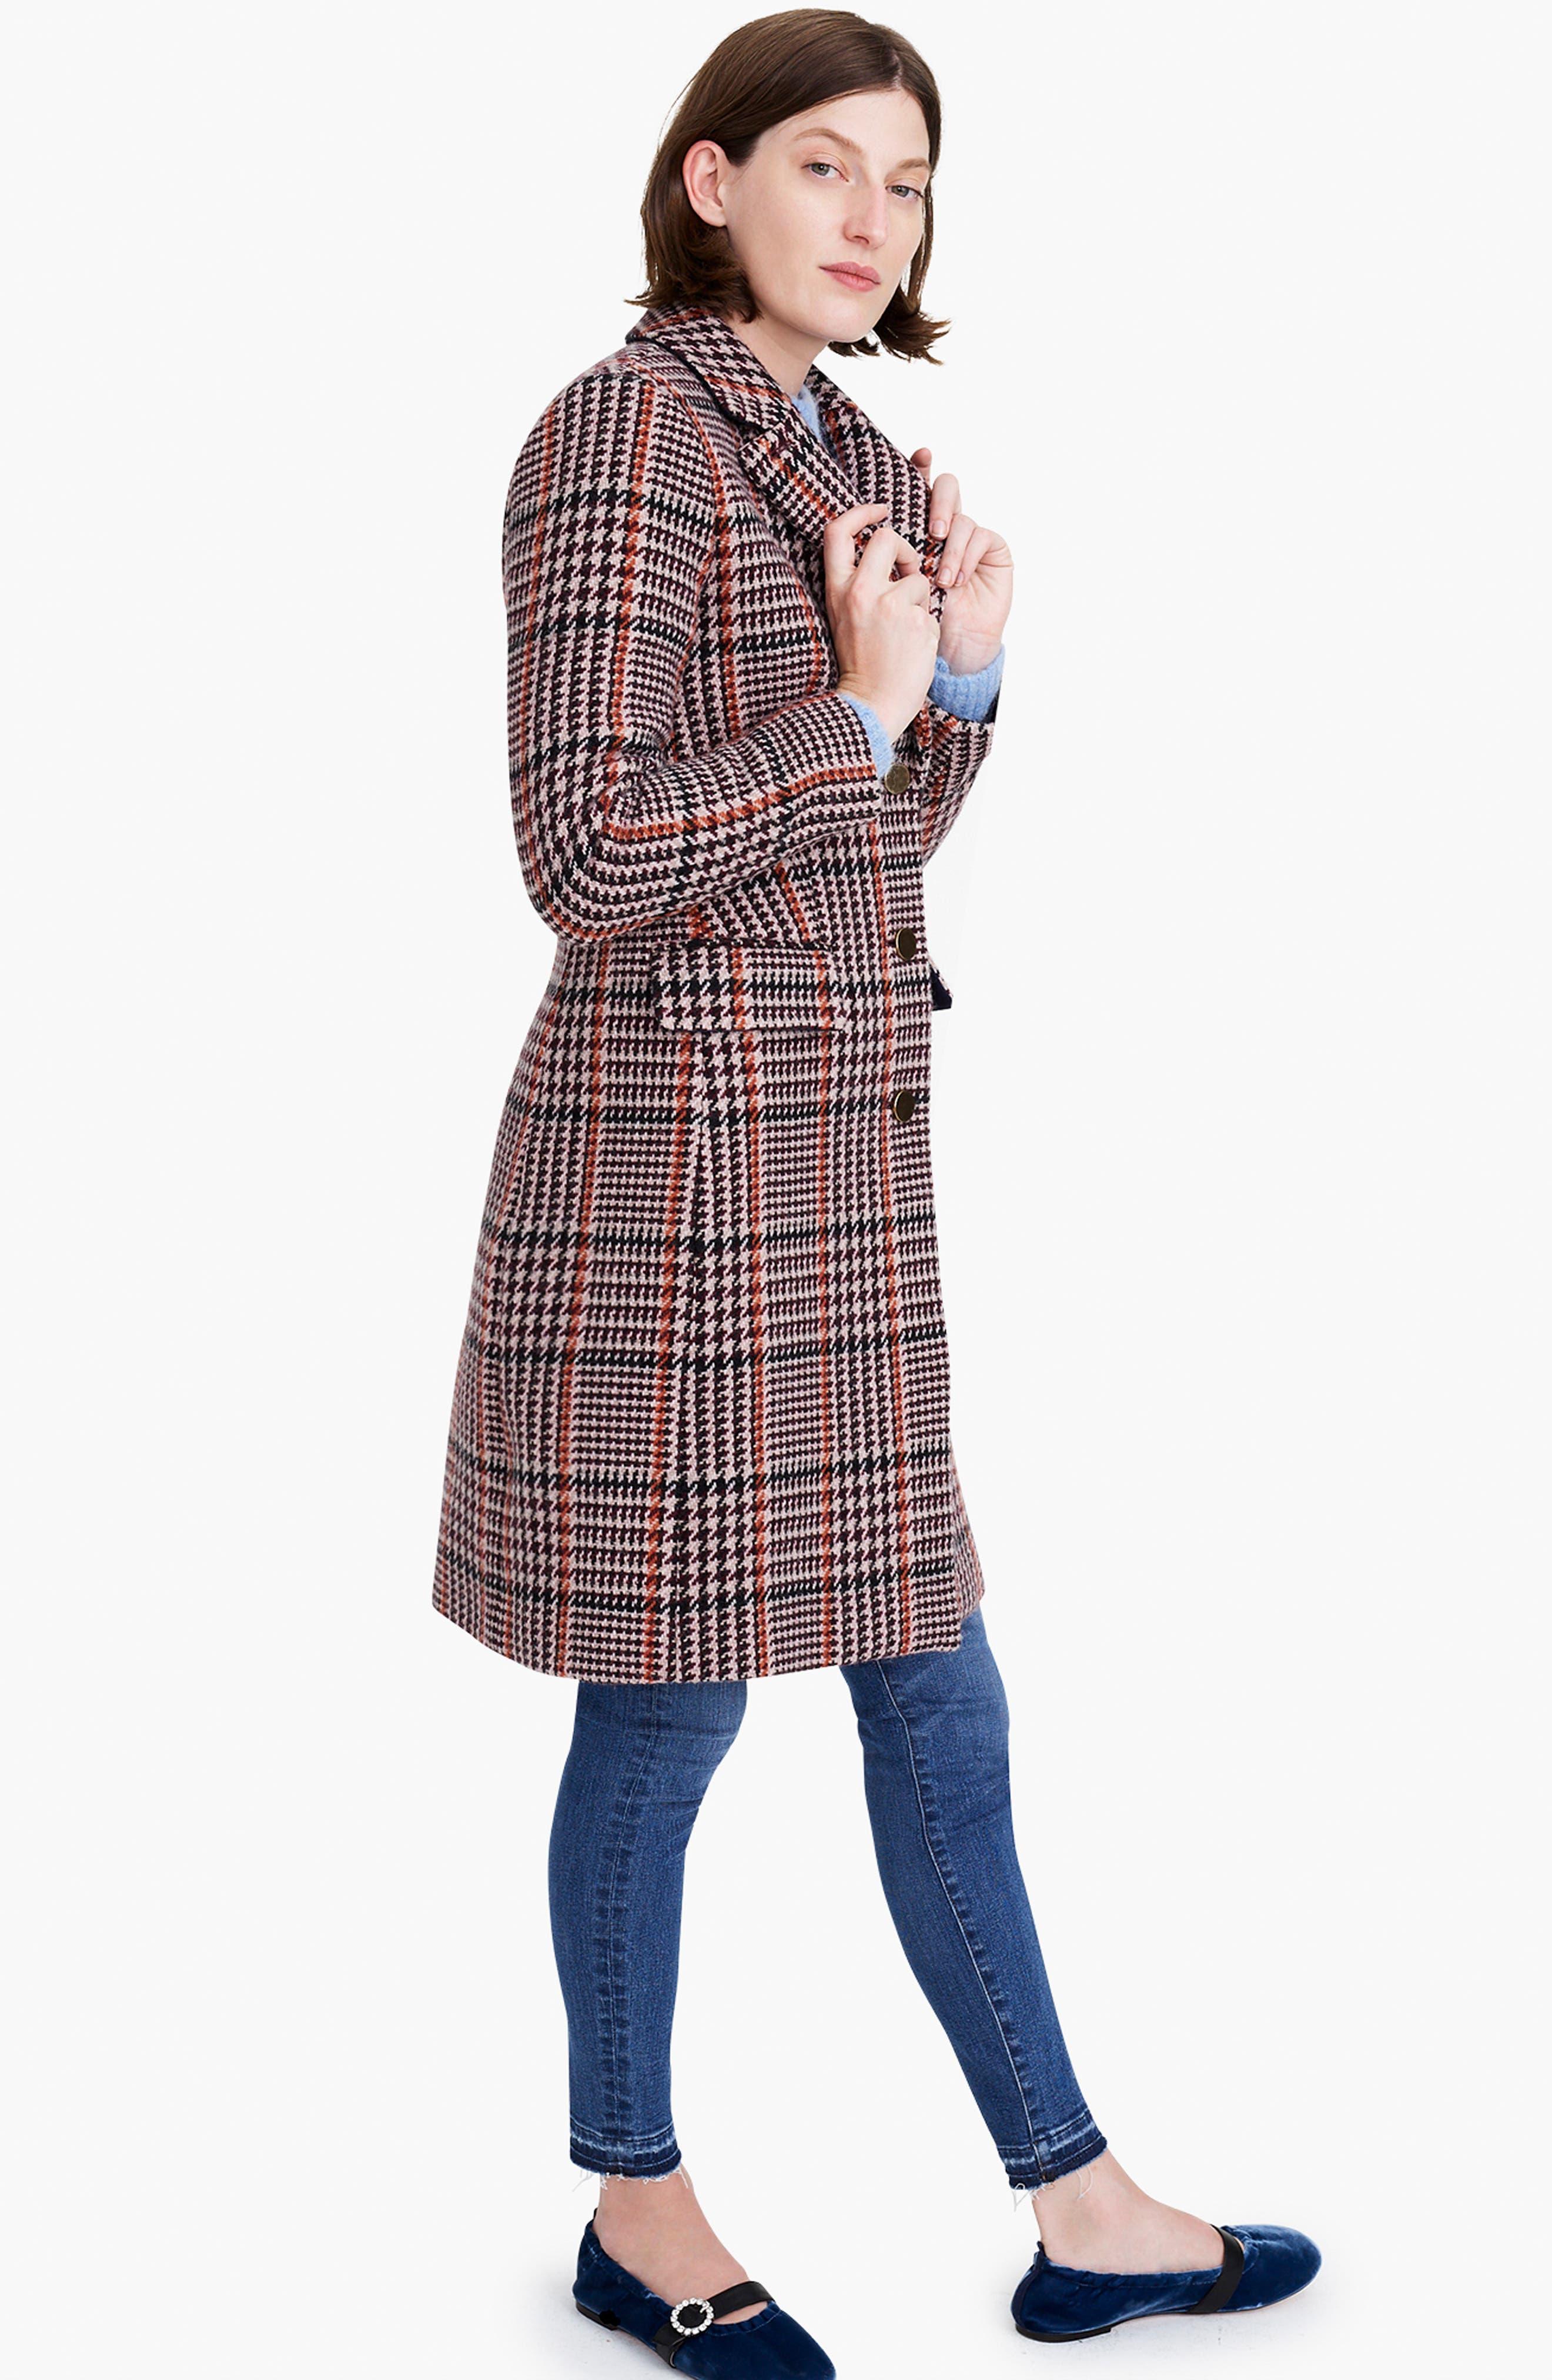 Plaid Single Breasted Topcoat,                             Alternate thumbnail 9, color,                             CABERNET PLAID